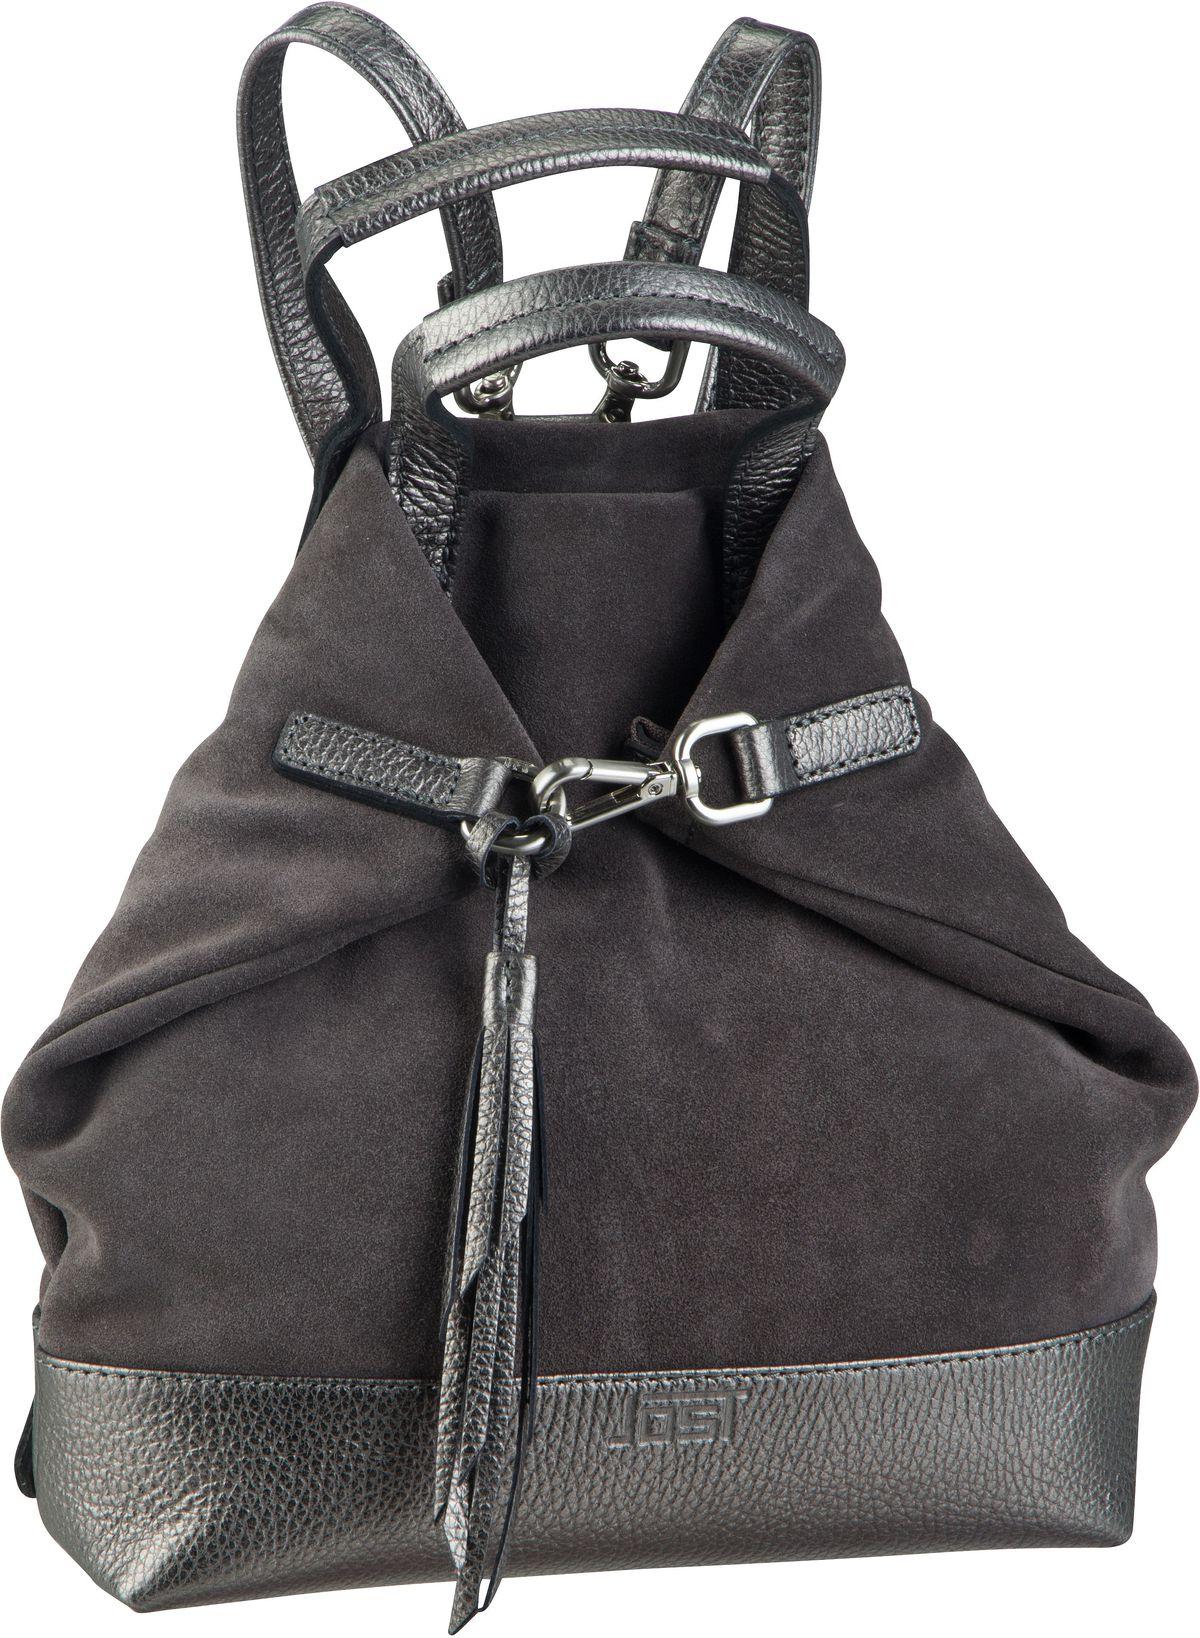 Rucksack / Daypack Motala 1744 X-Change Bag 3in1 Mini Silver